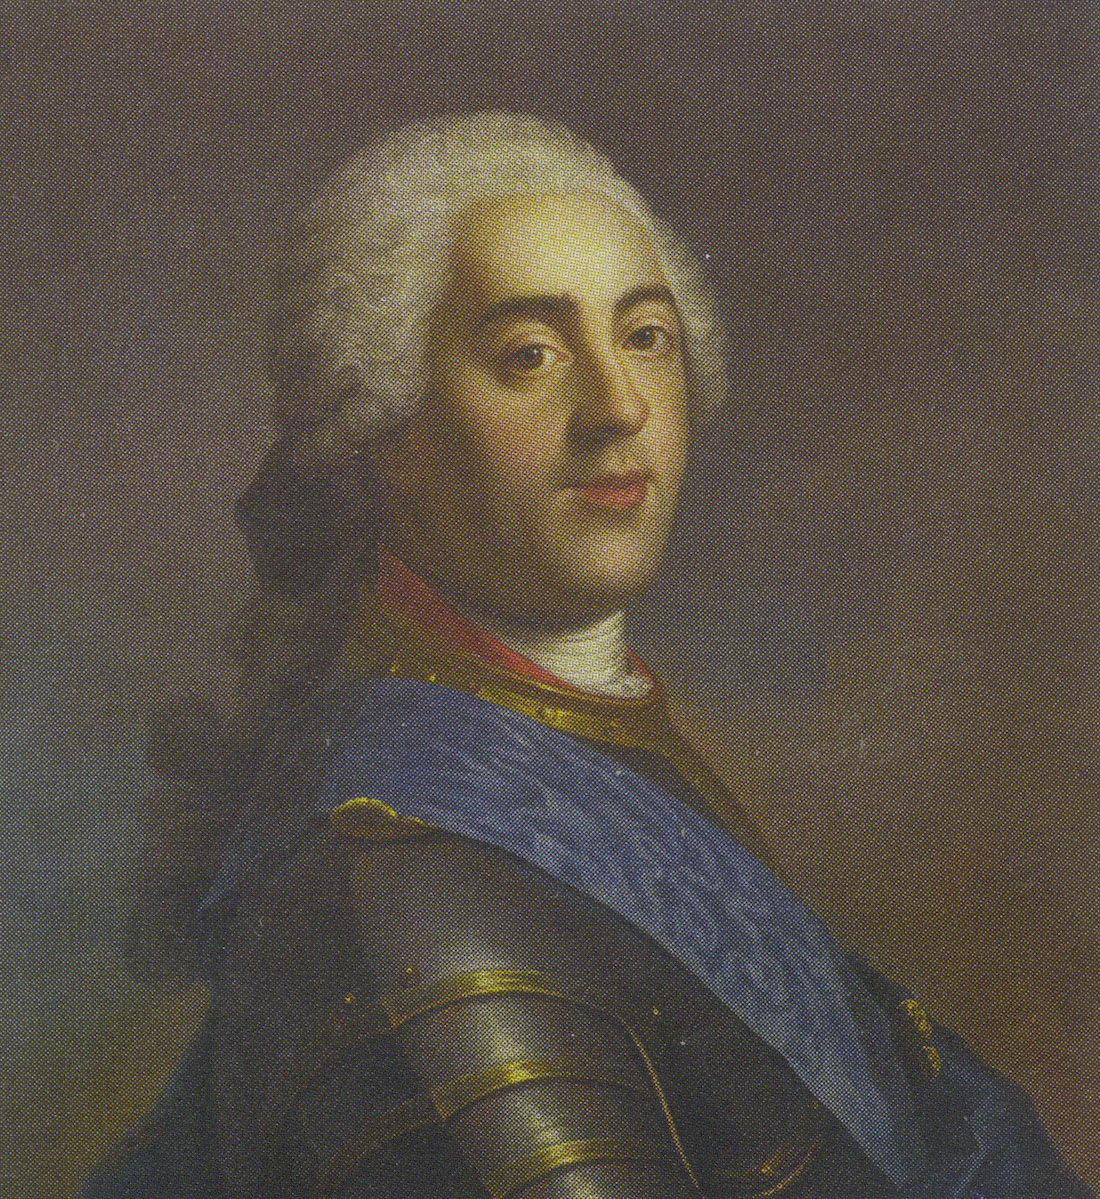 Портрет французского короля Людовика XV из династии Бурбонов